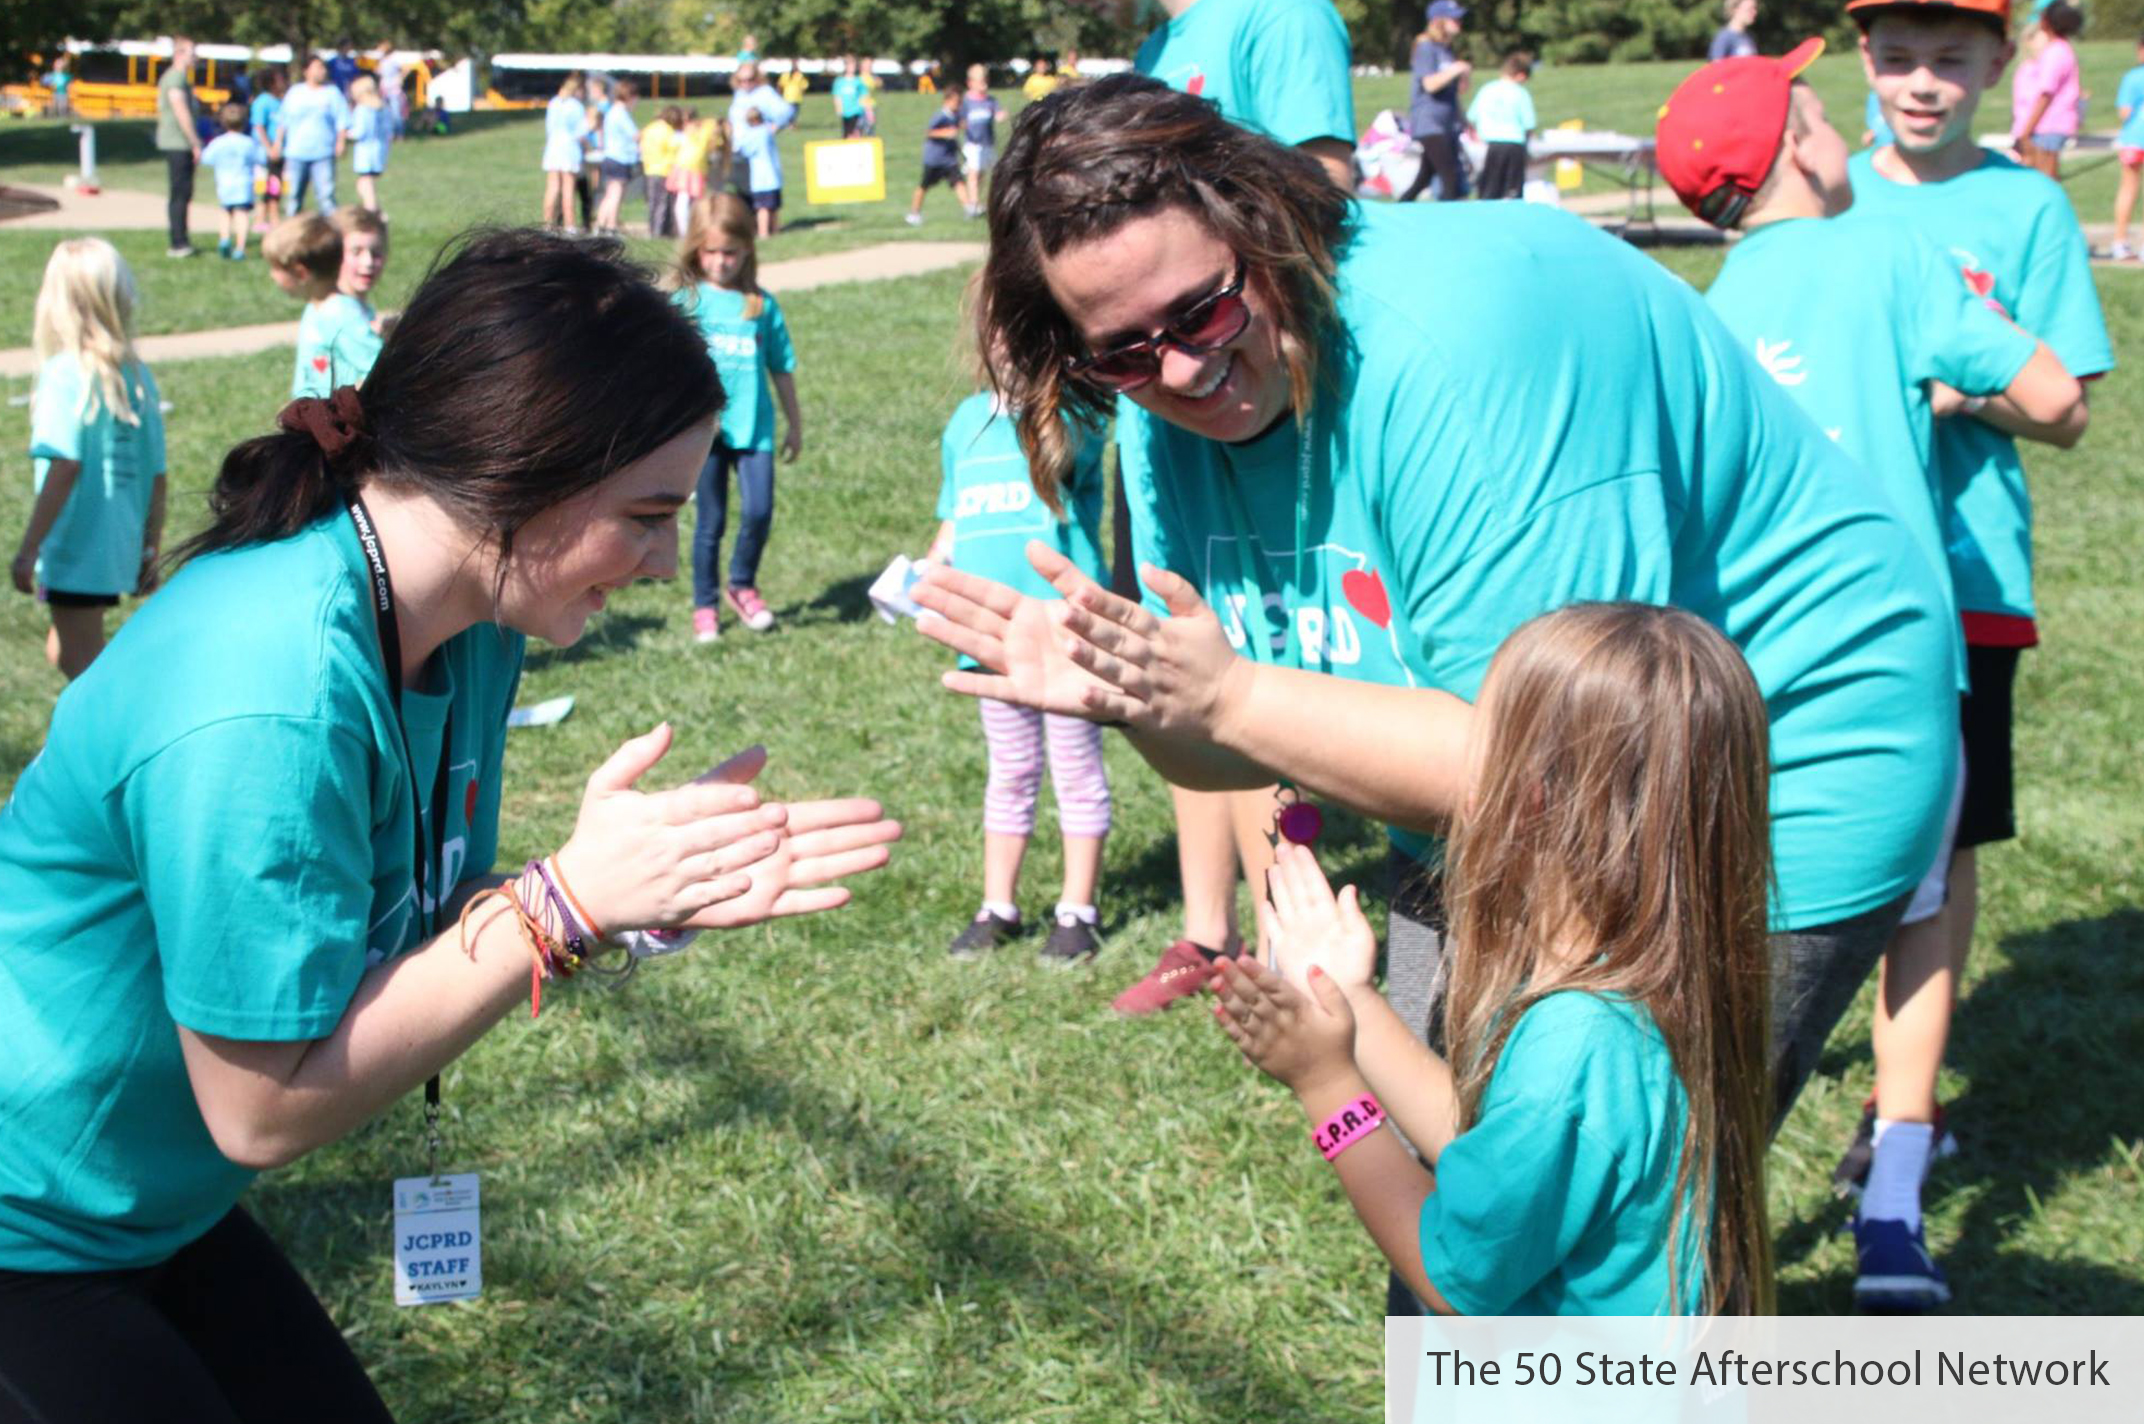 Teachers talking with child